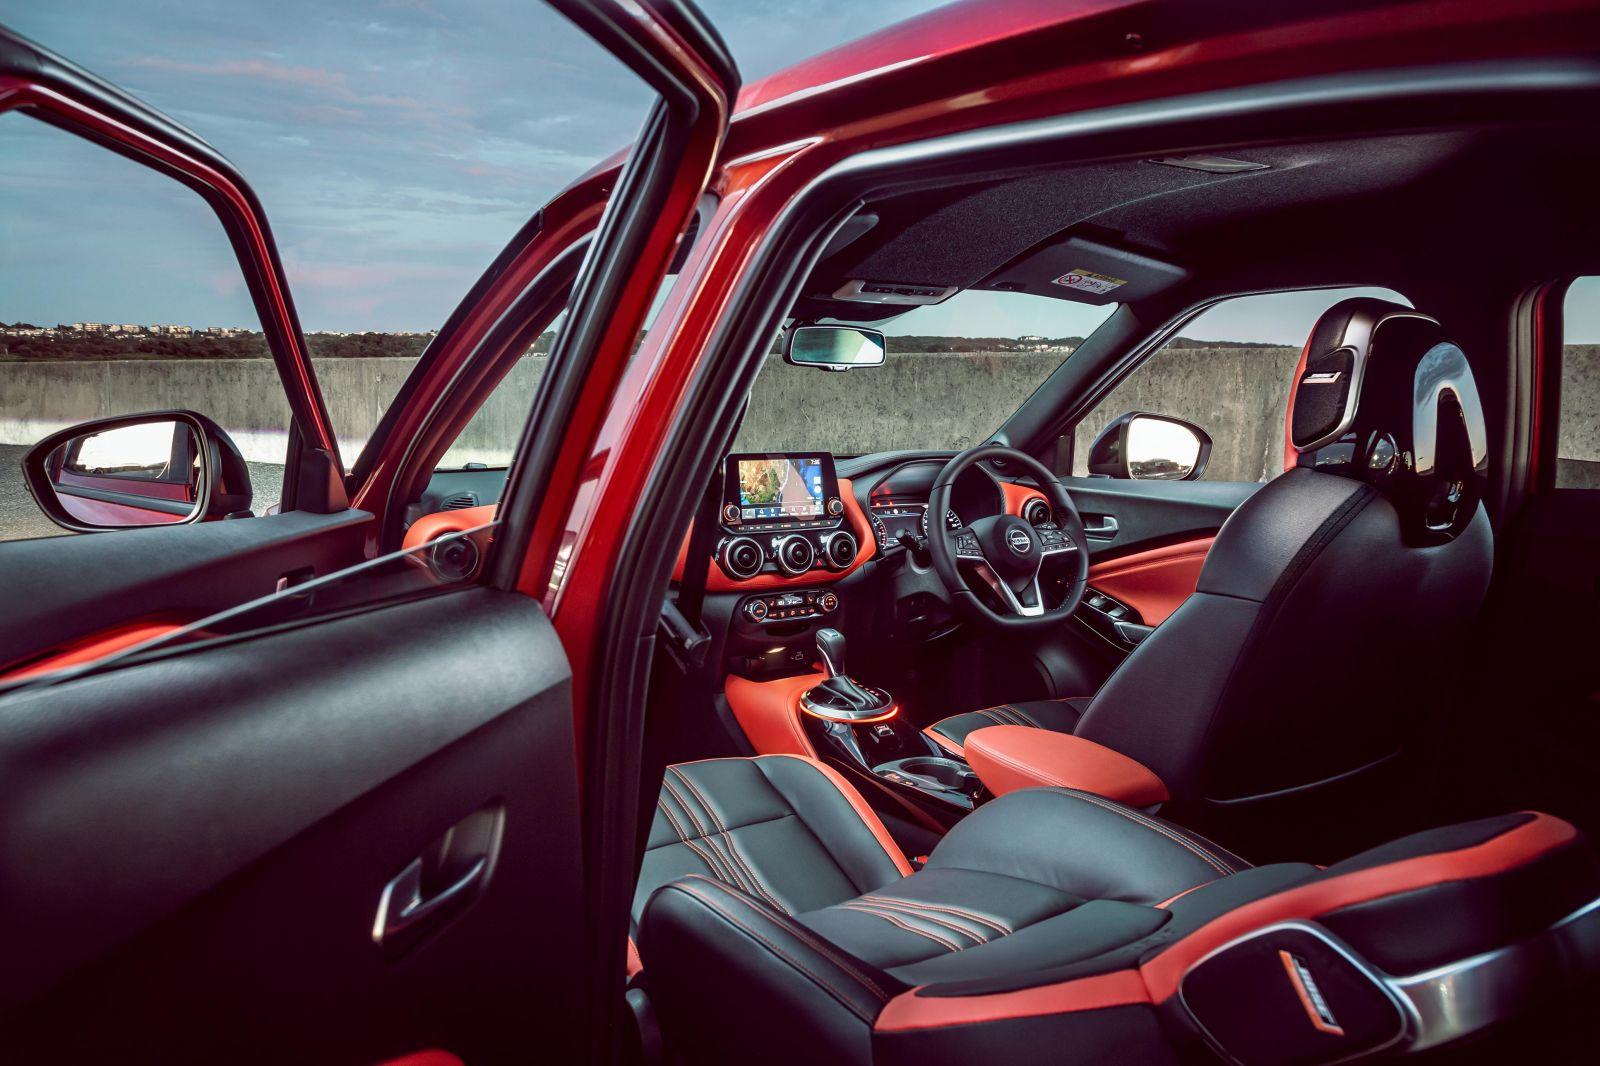 2021 Nissan Juke price and specs | CarExpert